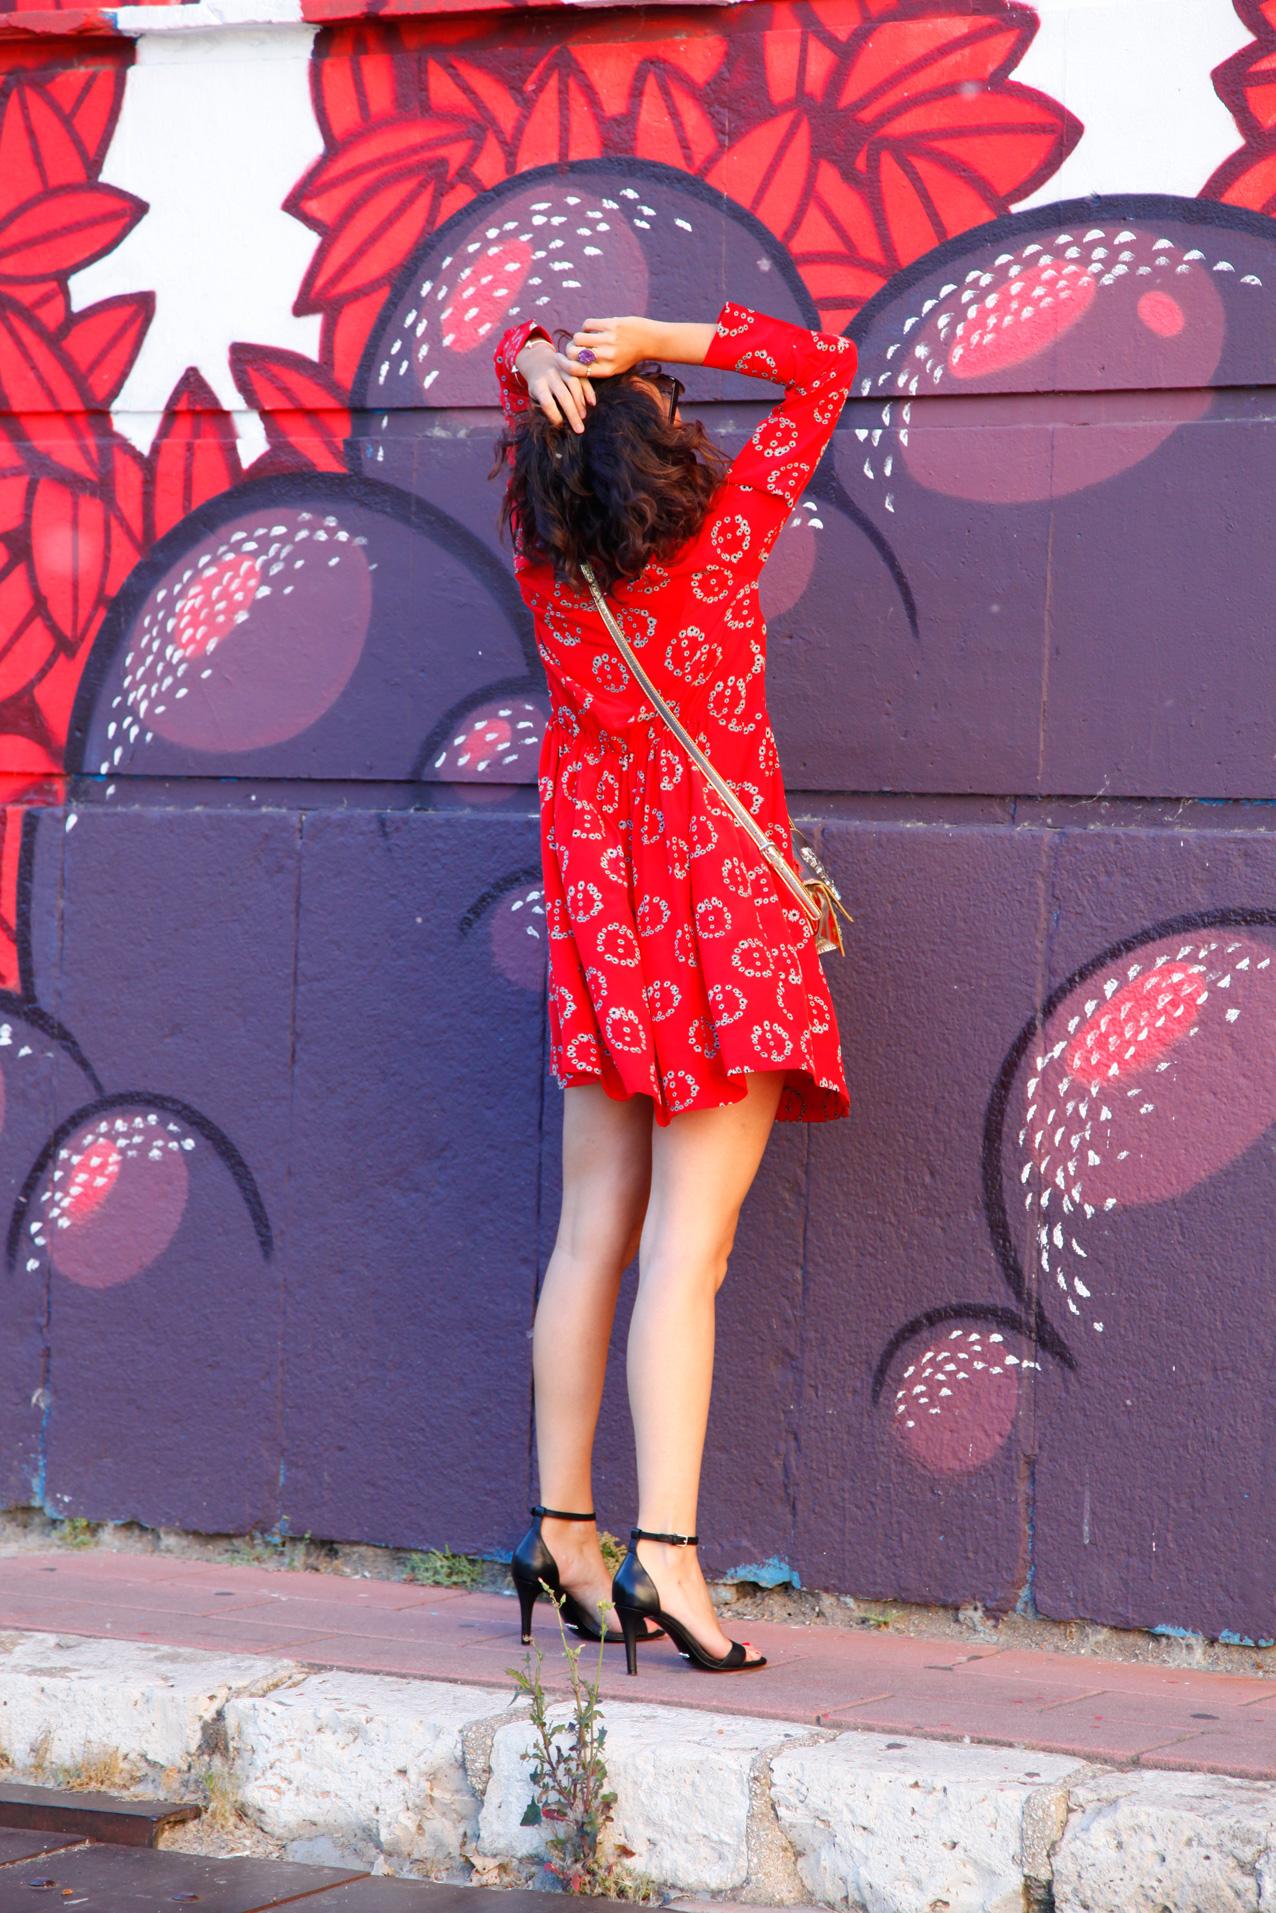 sandro_ss16-peace-red_dress-streetstyle-cool_lemonade